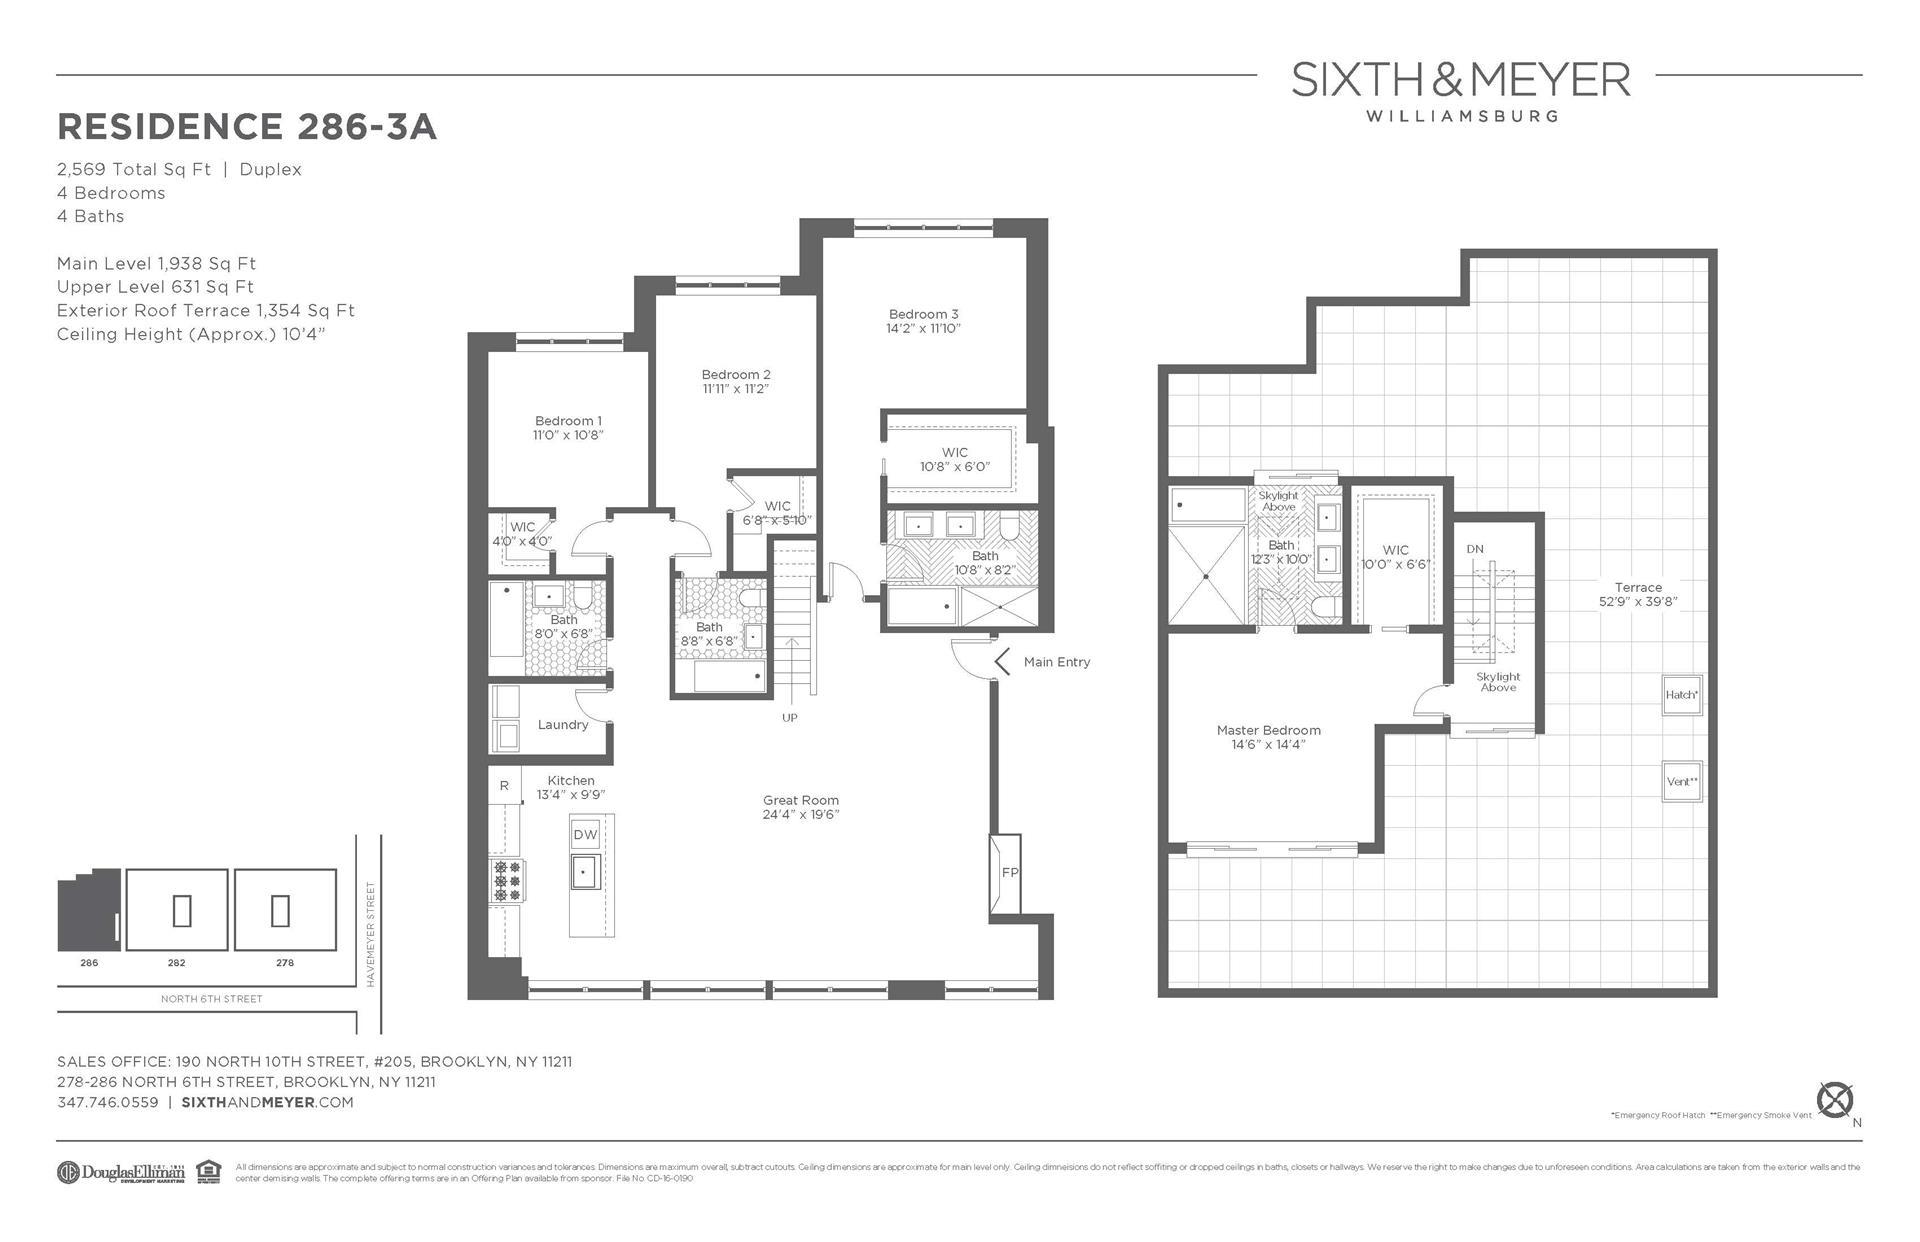 Floor plan of Sixth & Meyer, 278-286 North 6th St, 286/3A - Williamsburg, New York